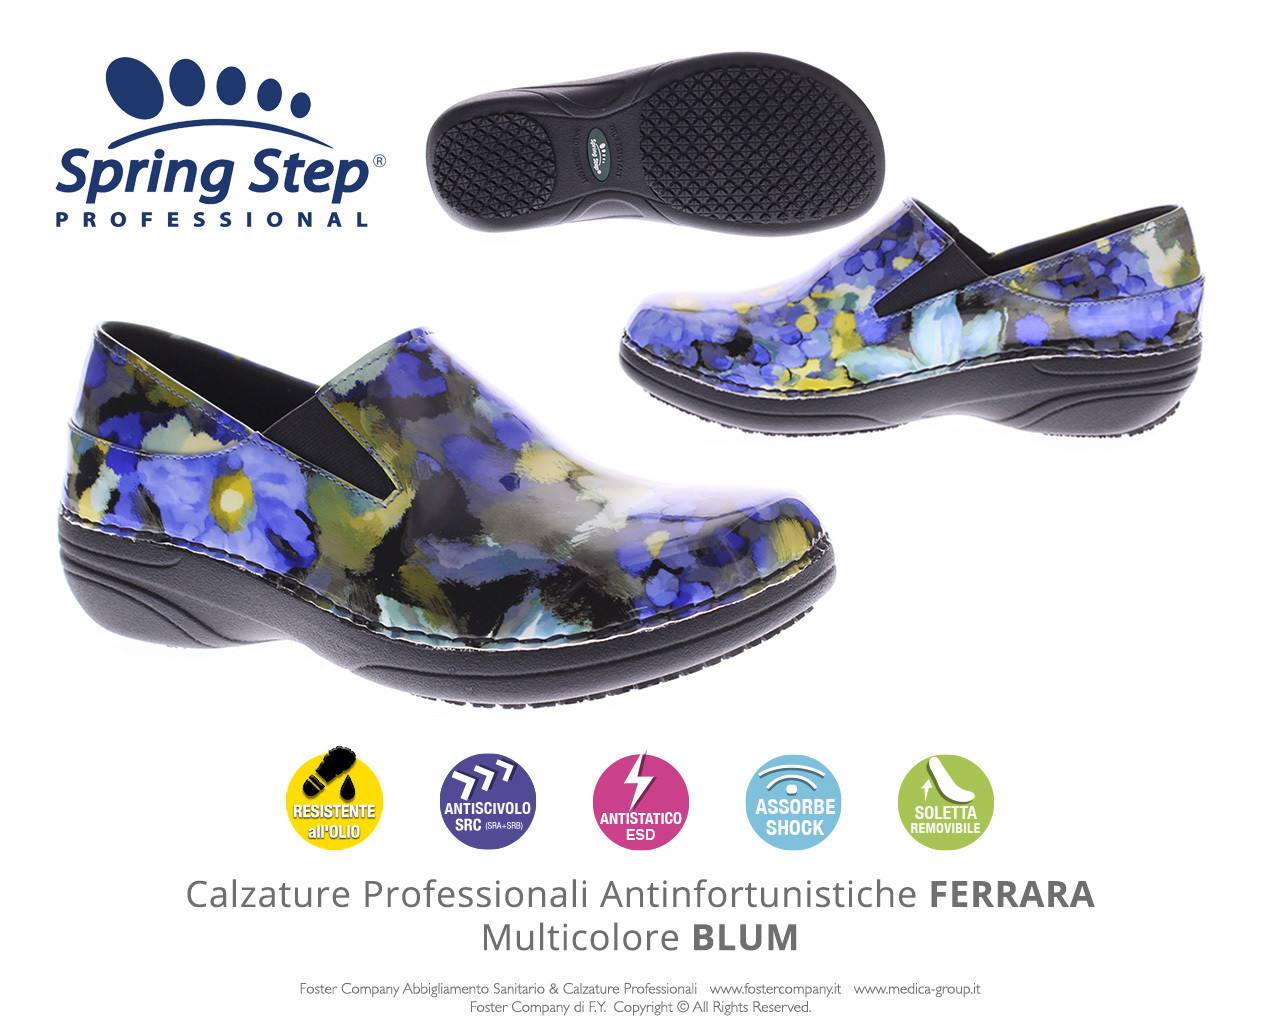 Calzature Professionali Spring Step FERRARA Multicolore BLUM